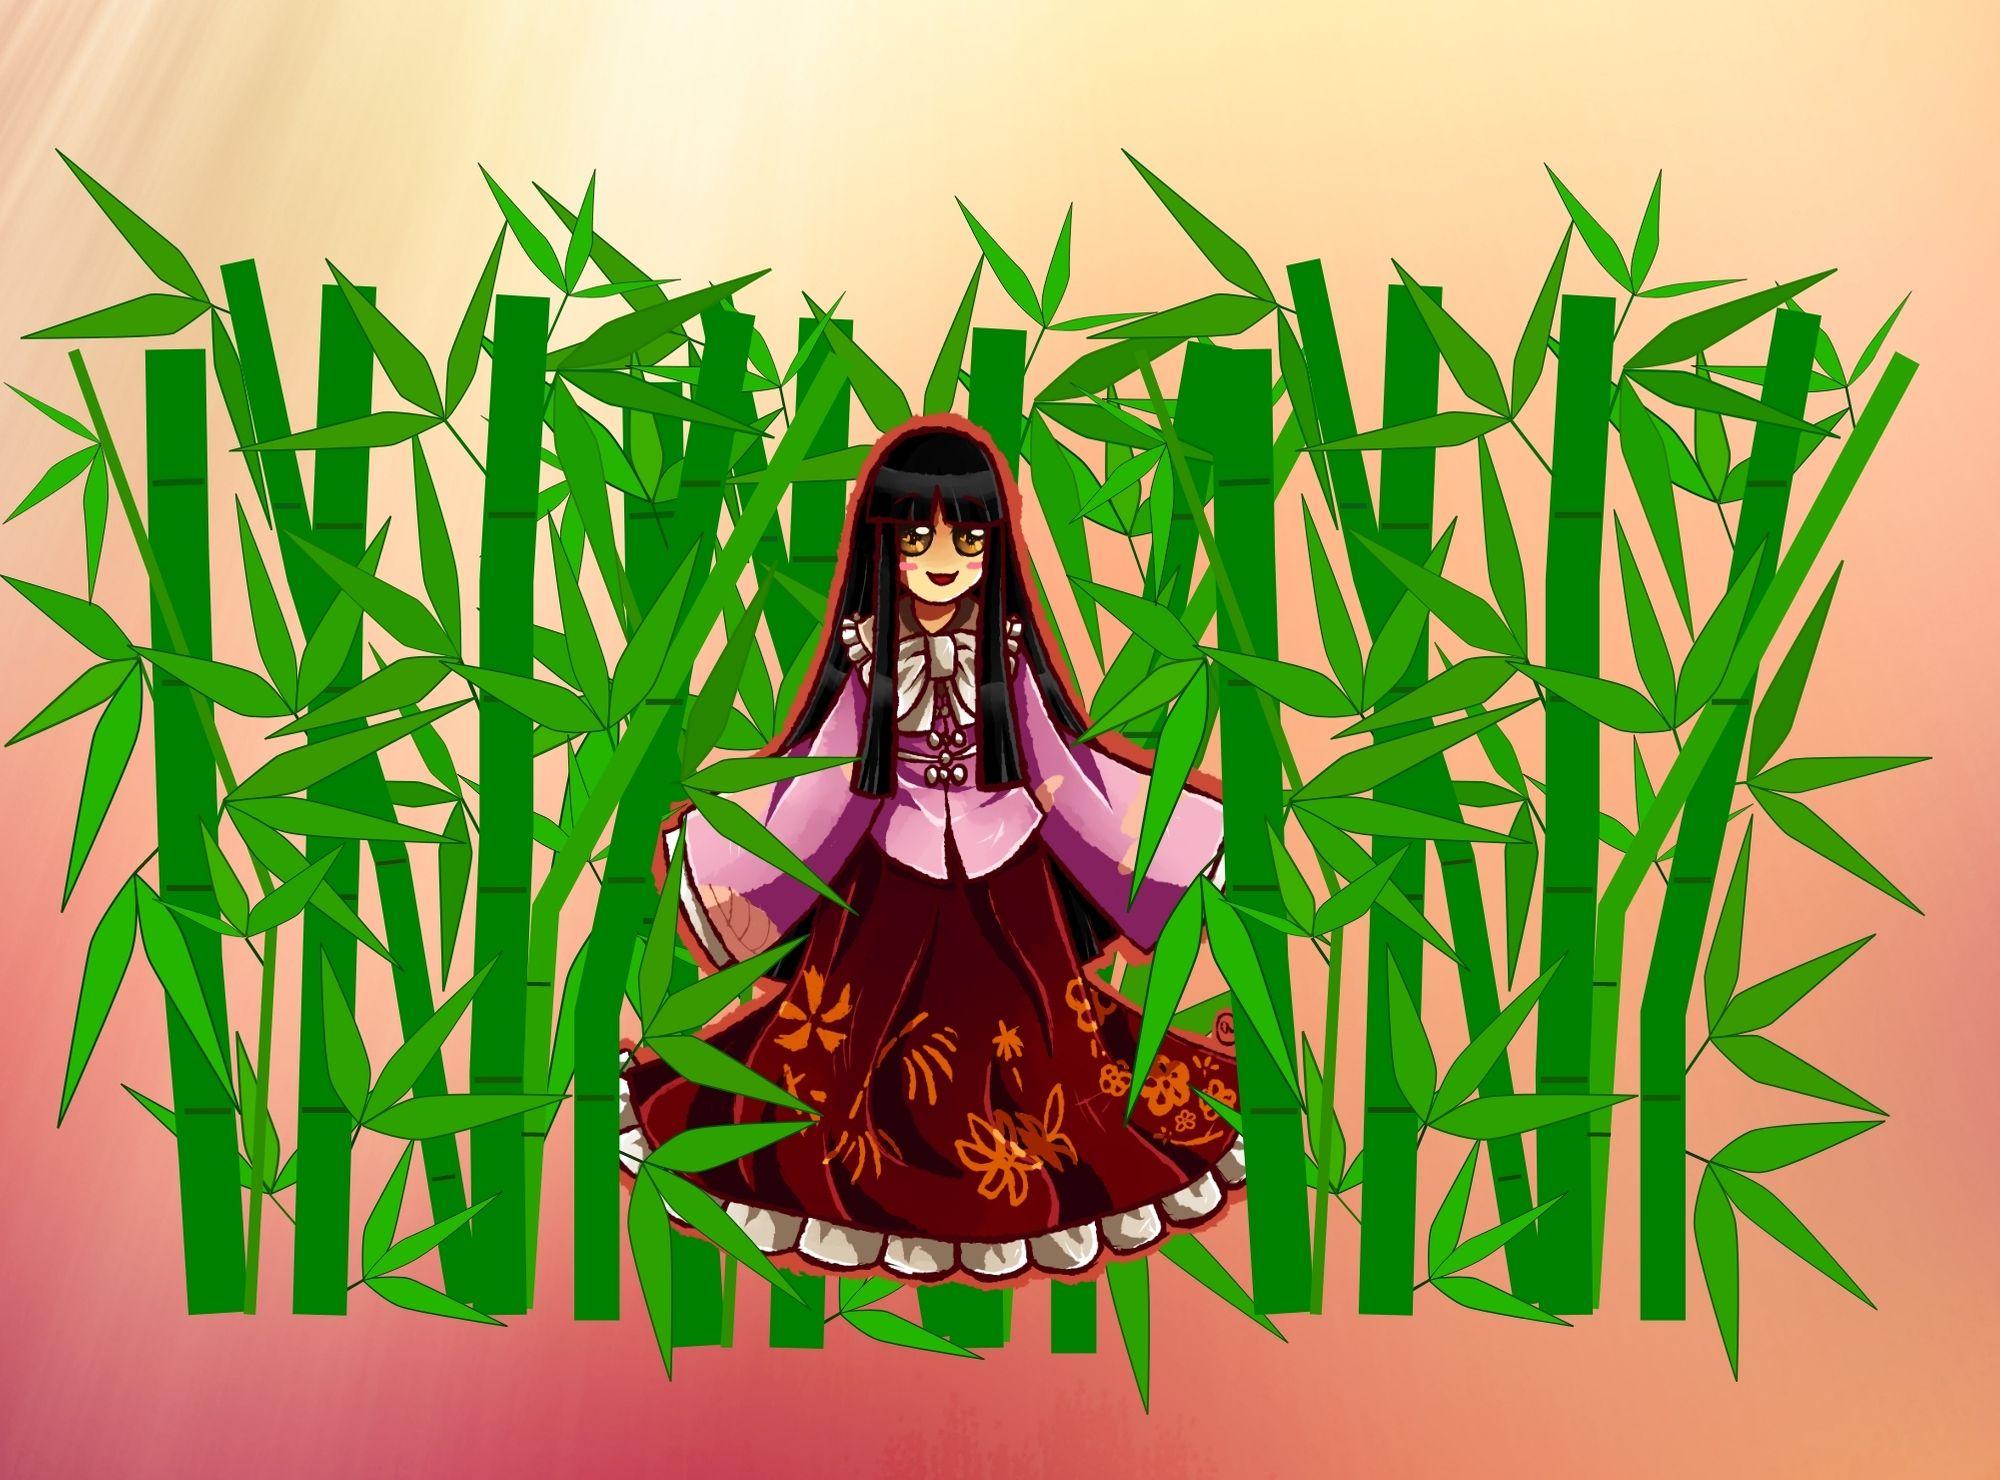 princesa kaguya japon